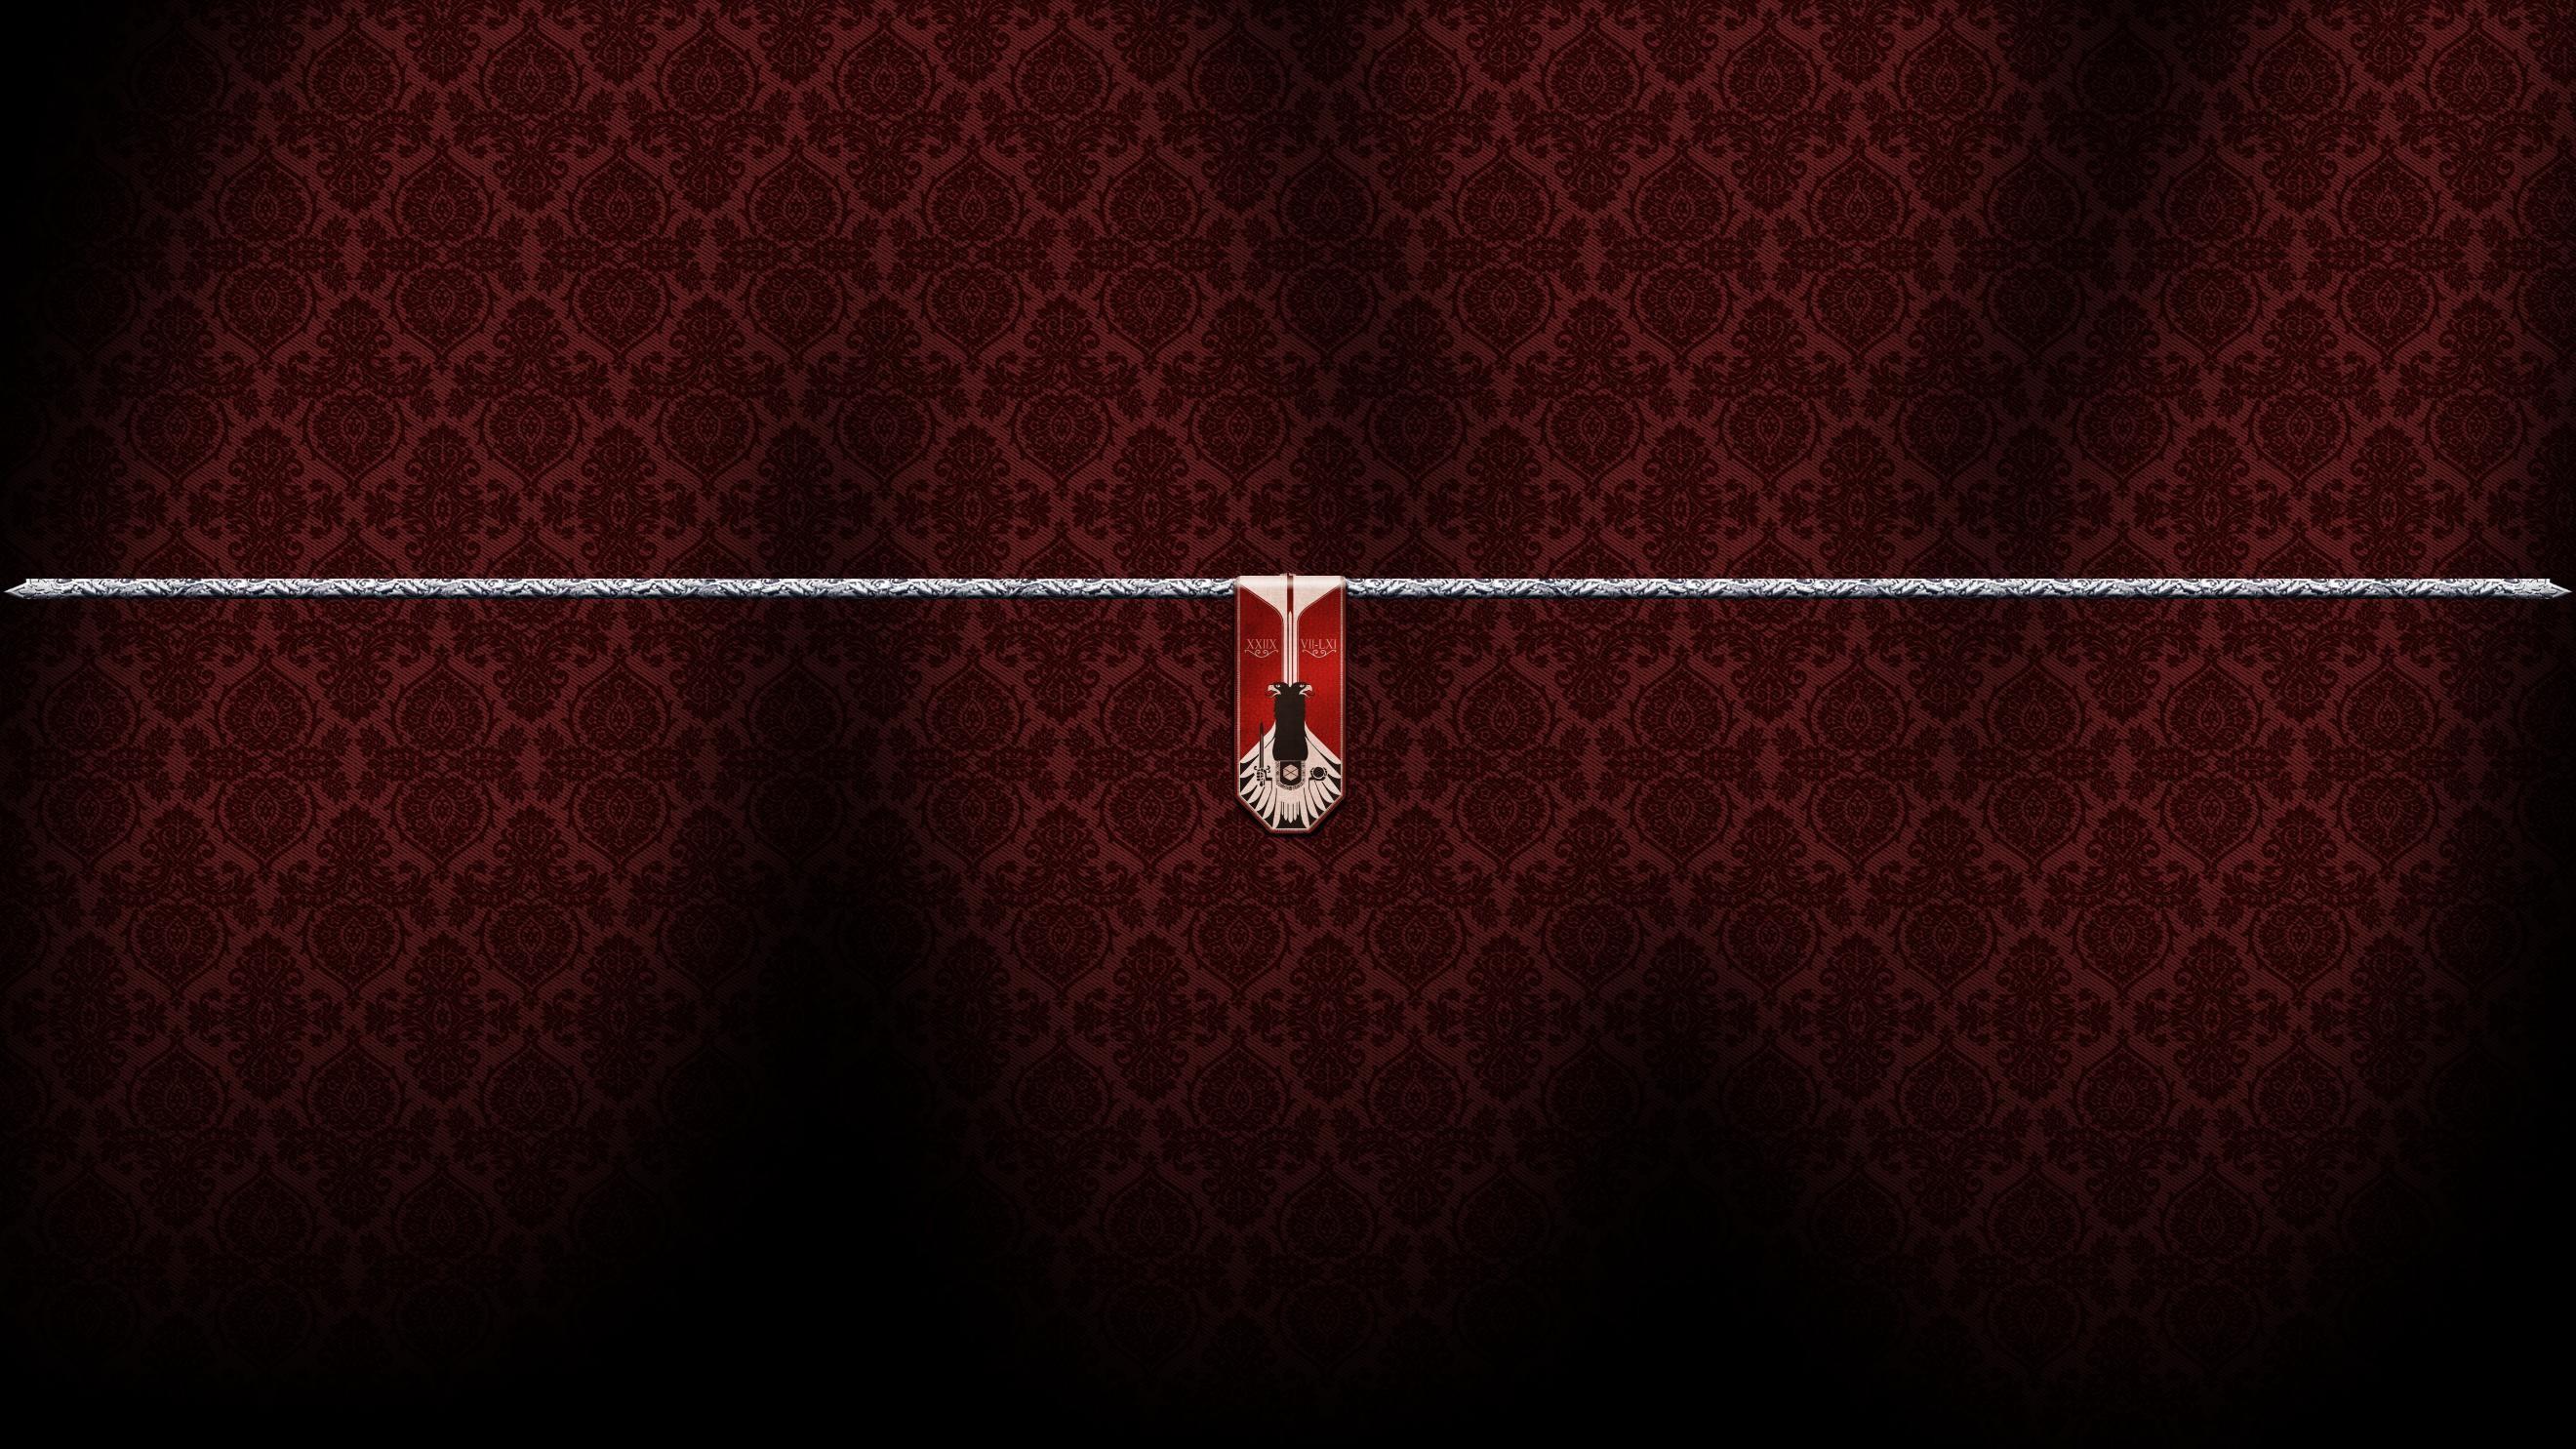 Imgur Wallpaper and Imgur YouTube Banner